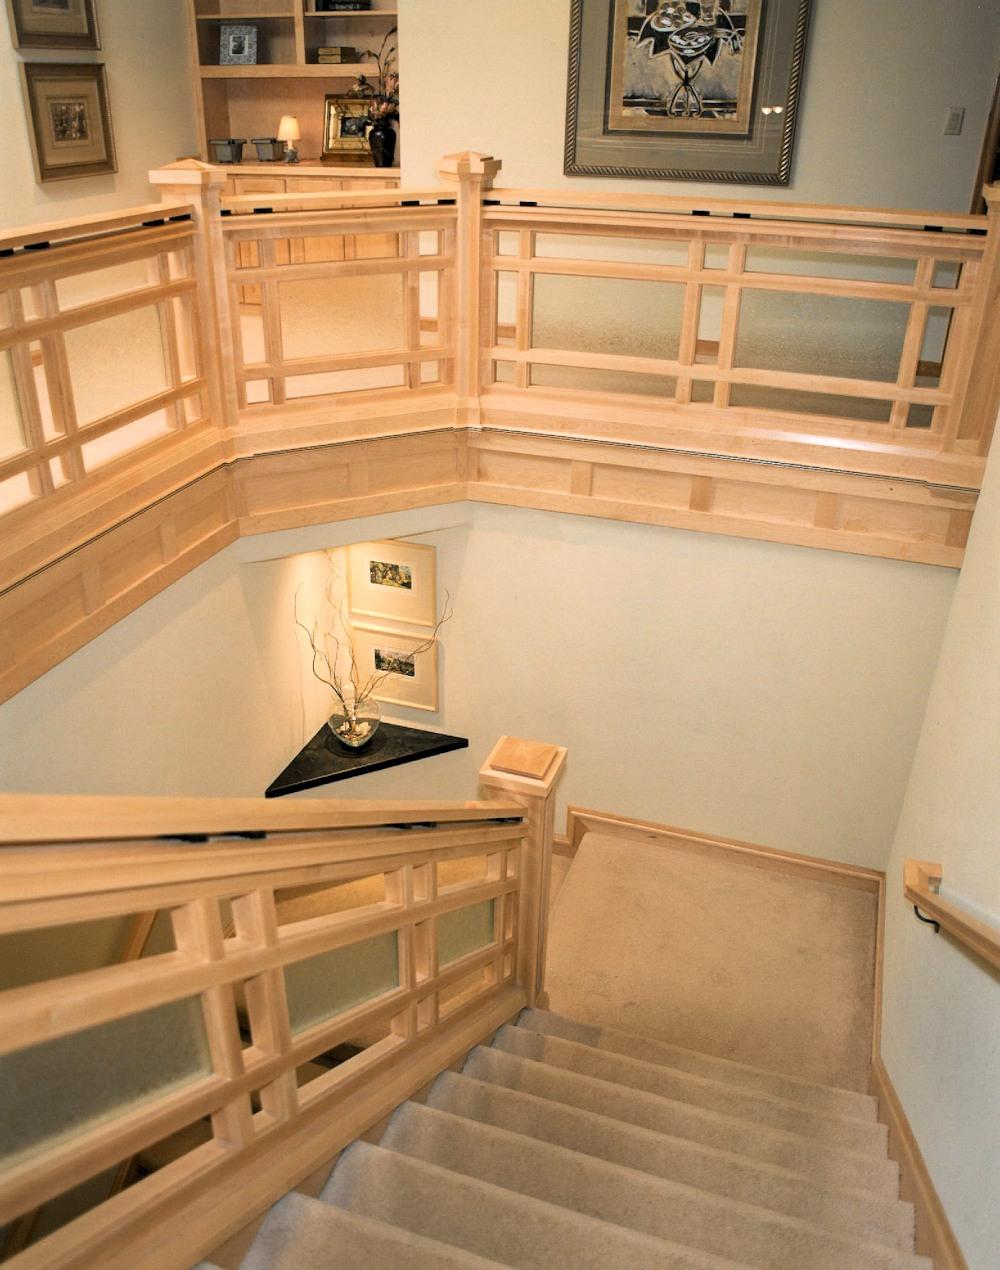 Oregon Spirit 1997 - Staircase - Bernard Custom Homes - Street of Dreams.